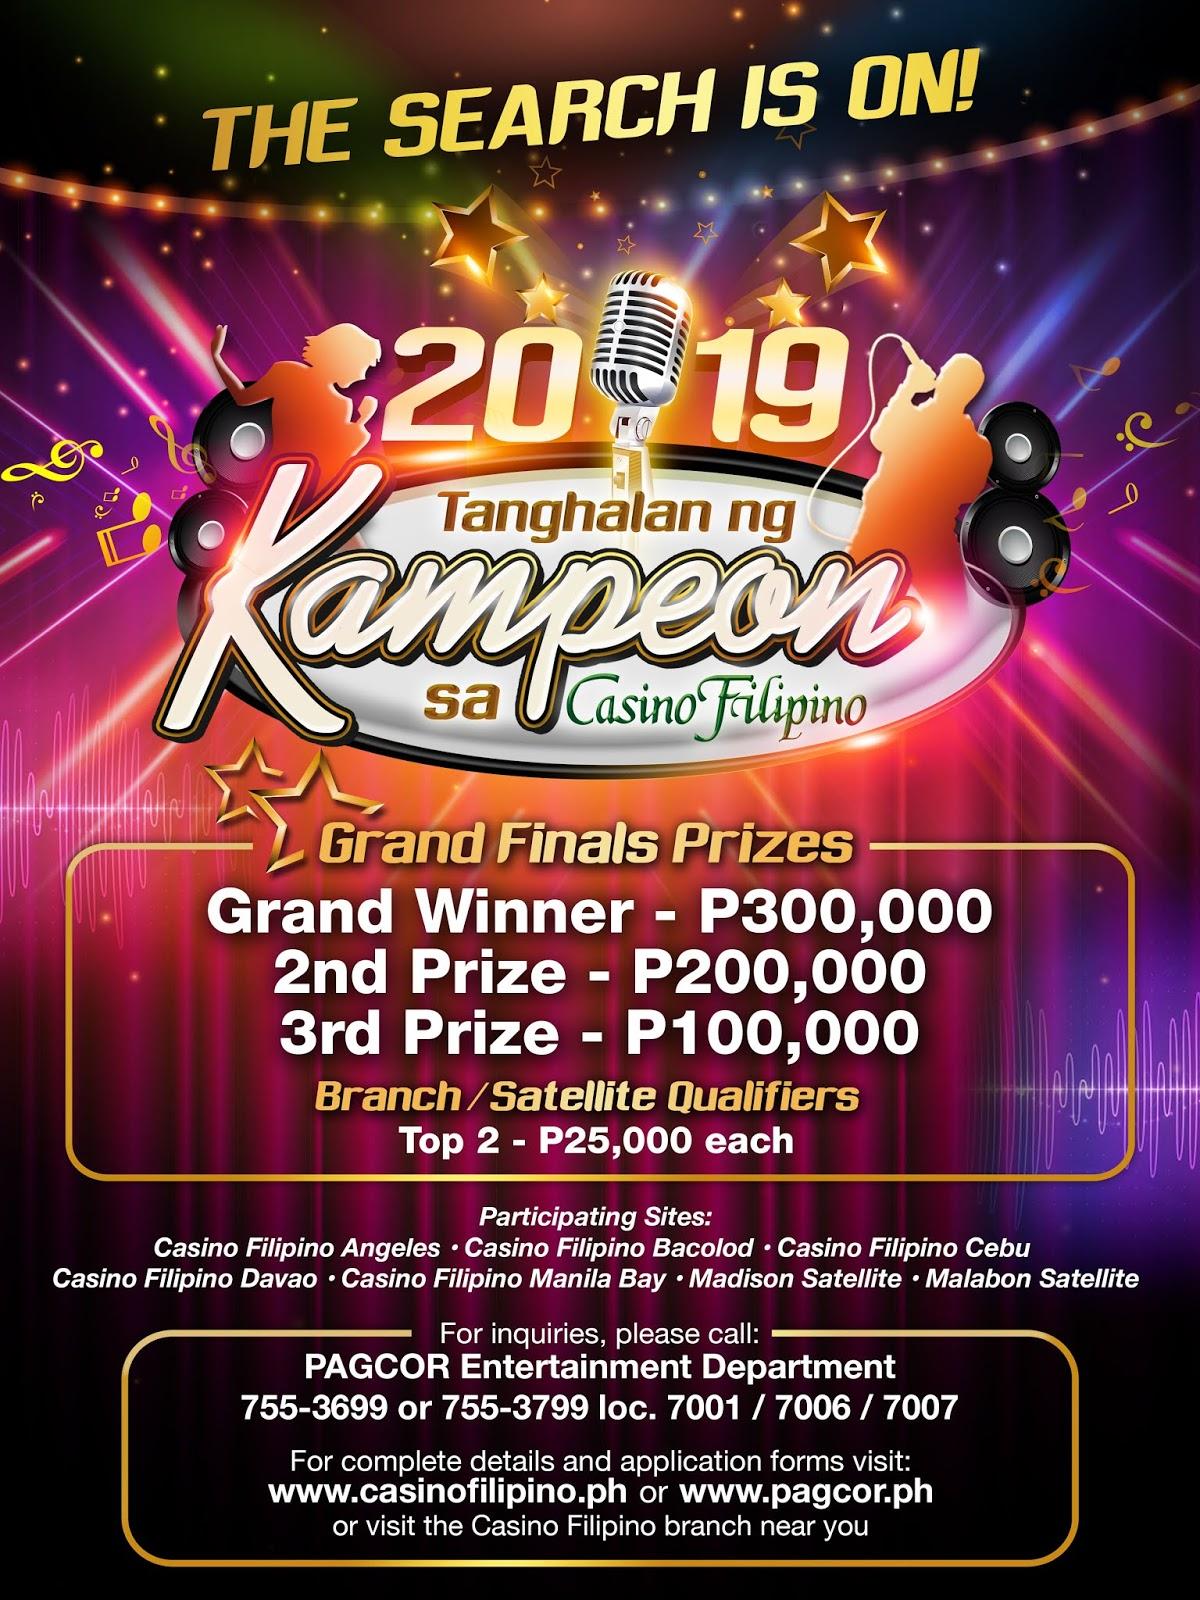 Casino Filipino to hold 'Tanghalan ng Kampeon' nationwide singing